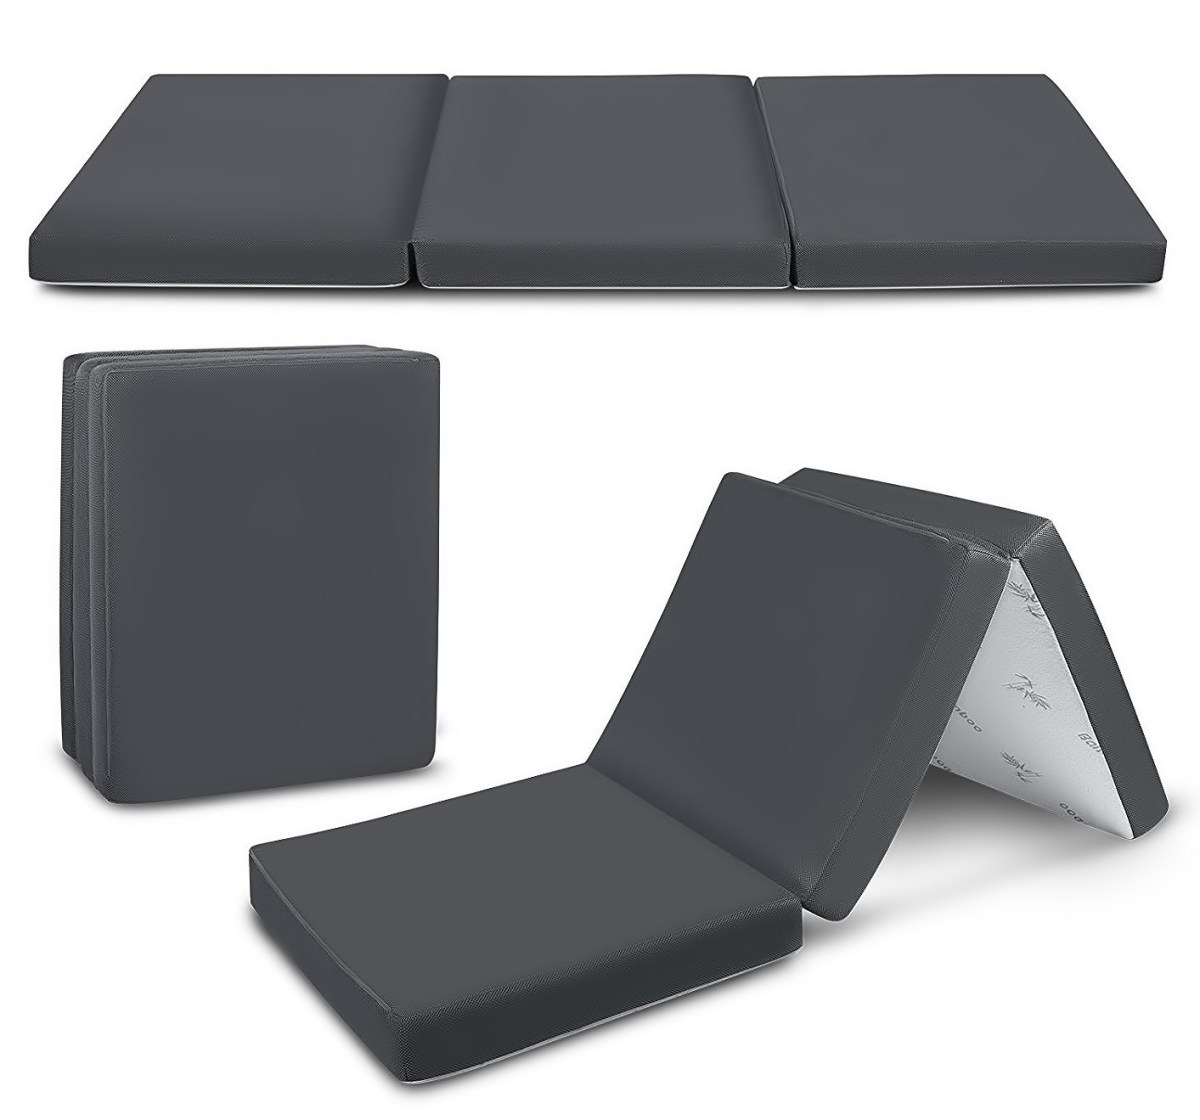 Cozzzi Trifold Foam Folding Mattress